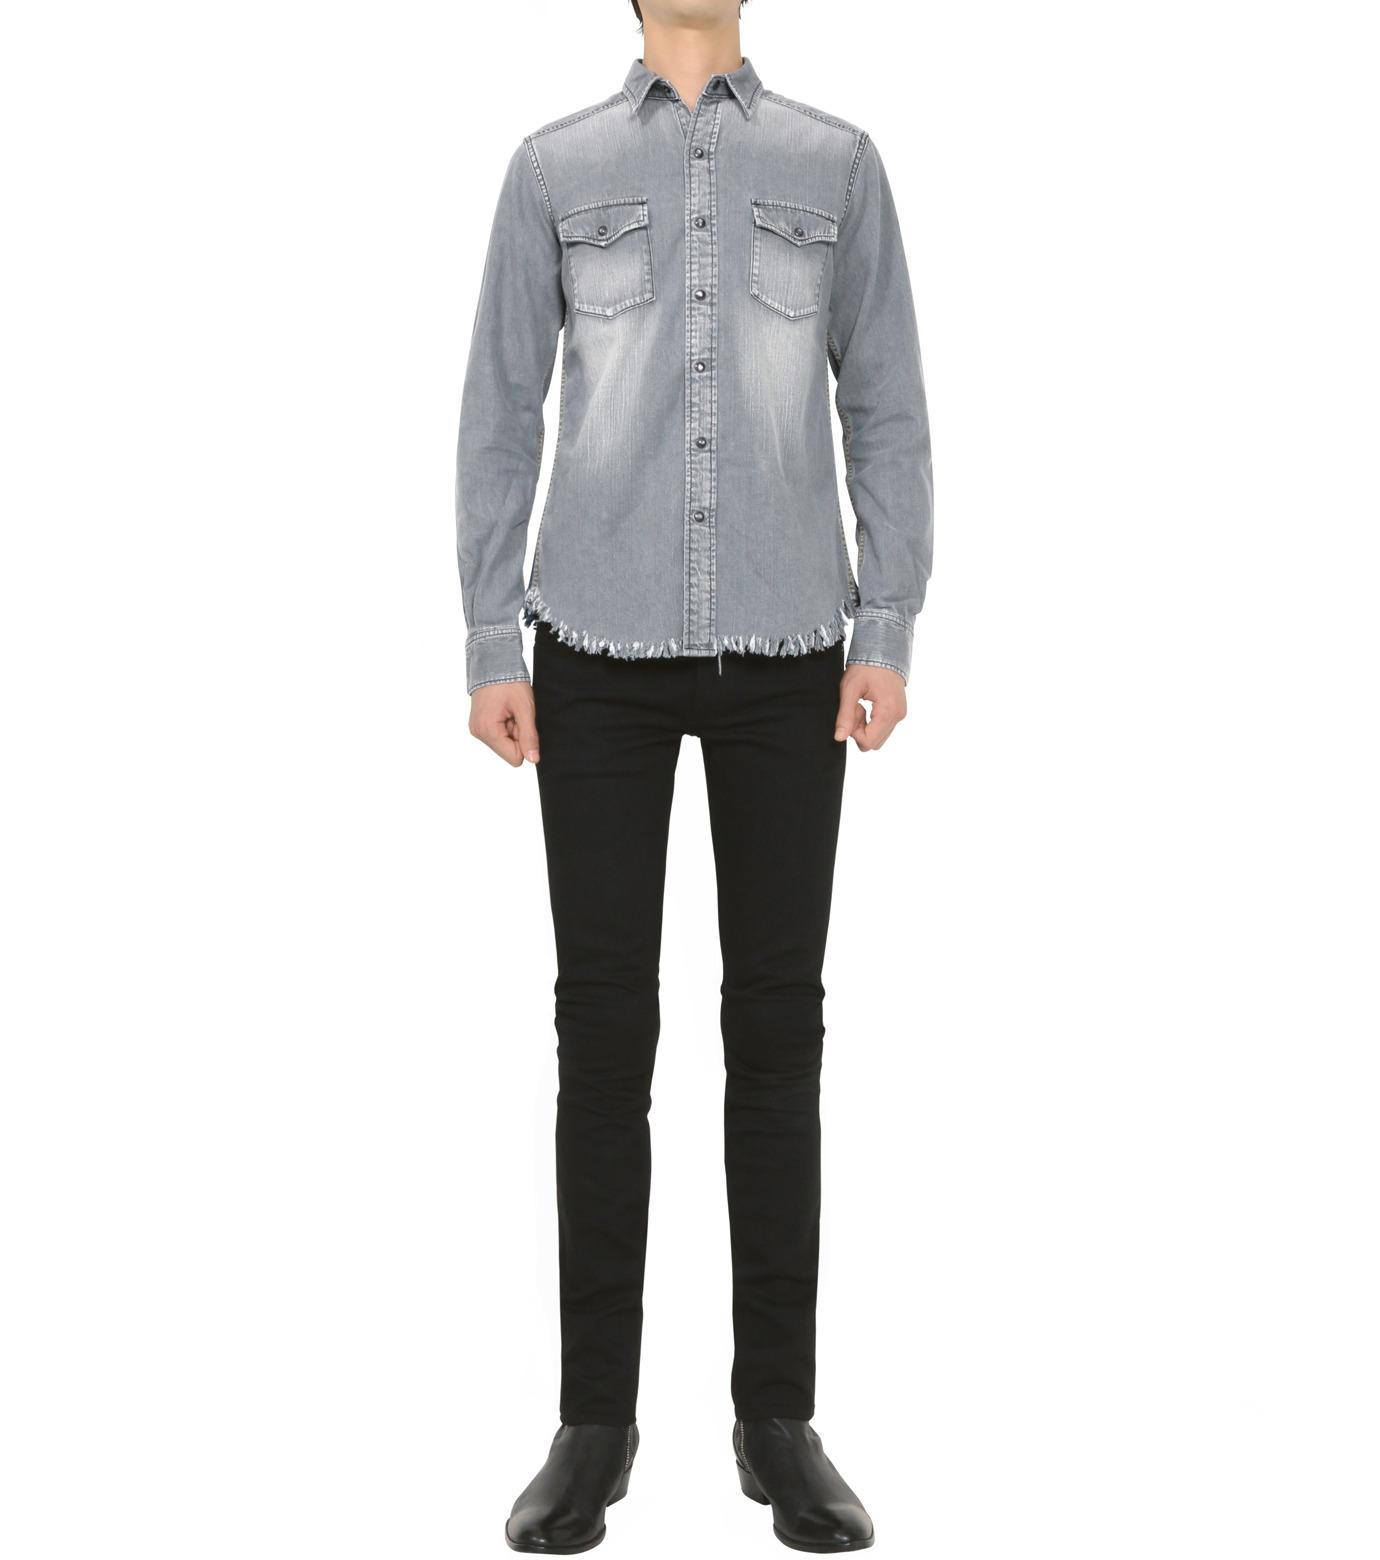 HL HEDDIE LOVU(エイチエル・エディールーヴ)のBK DENIM WASH SHIRT-GRAY(シャツ/shirt)-18S93004-11 拡大詳細画像5